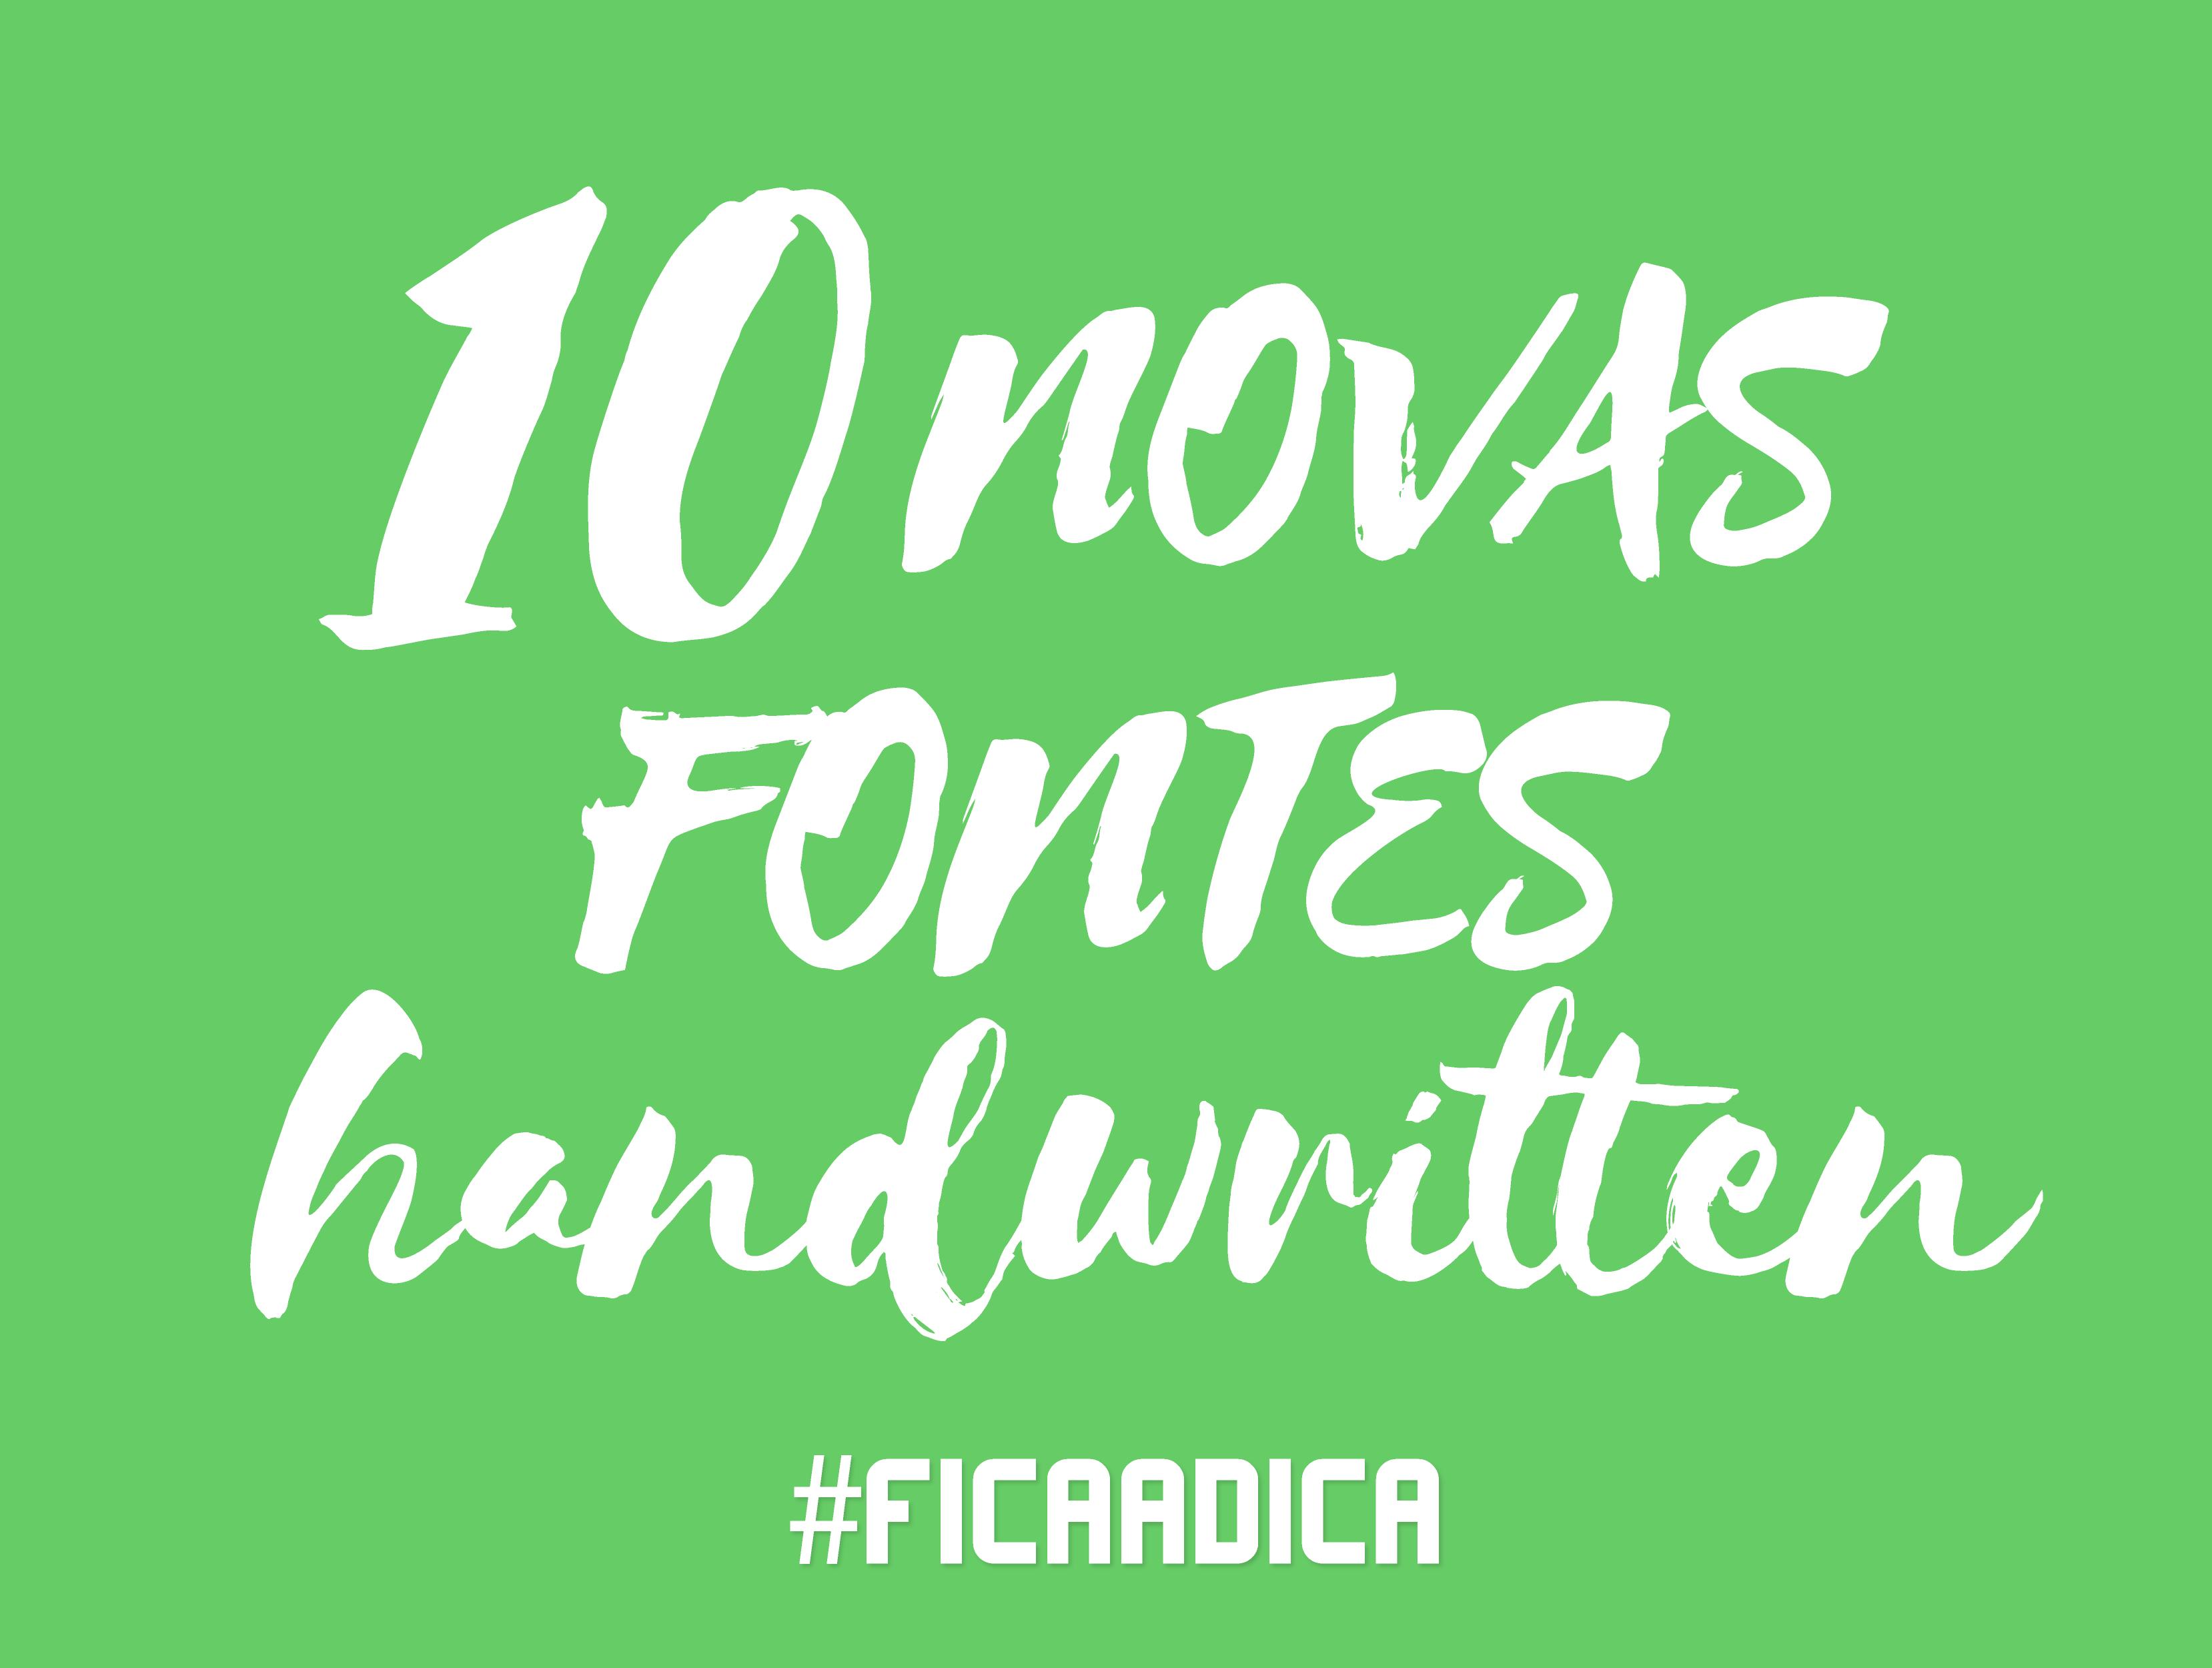 Fontes grátis Fontes gratuitas download Free Fonts